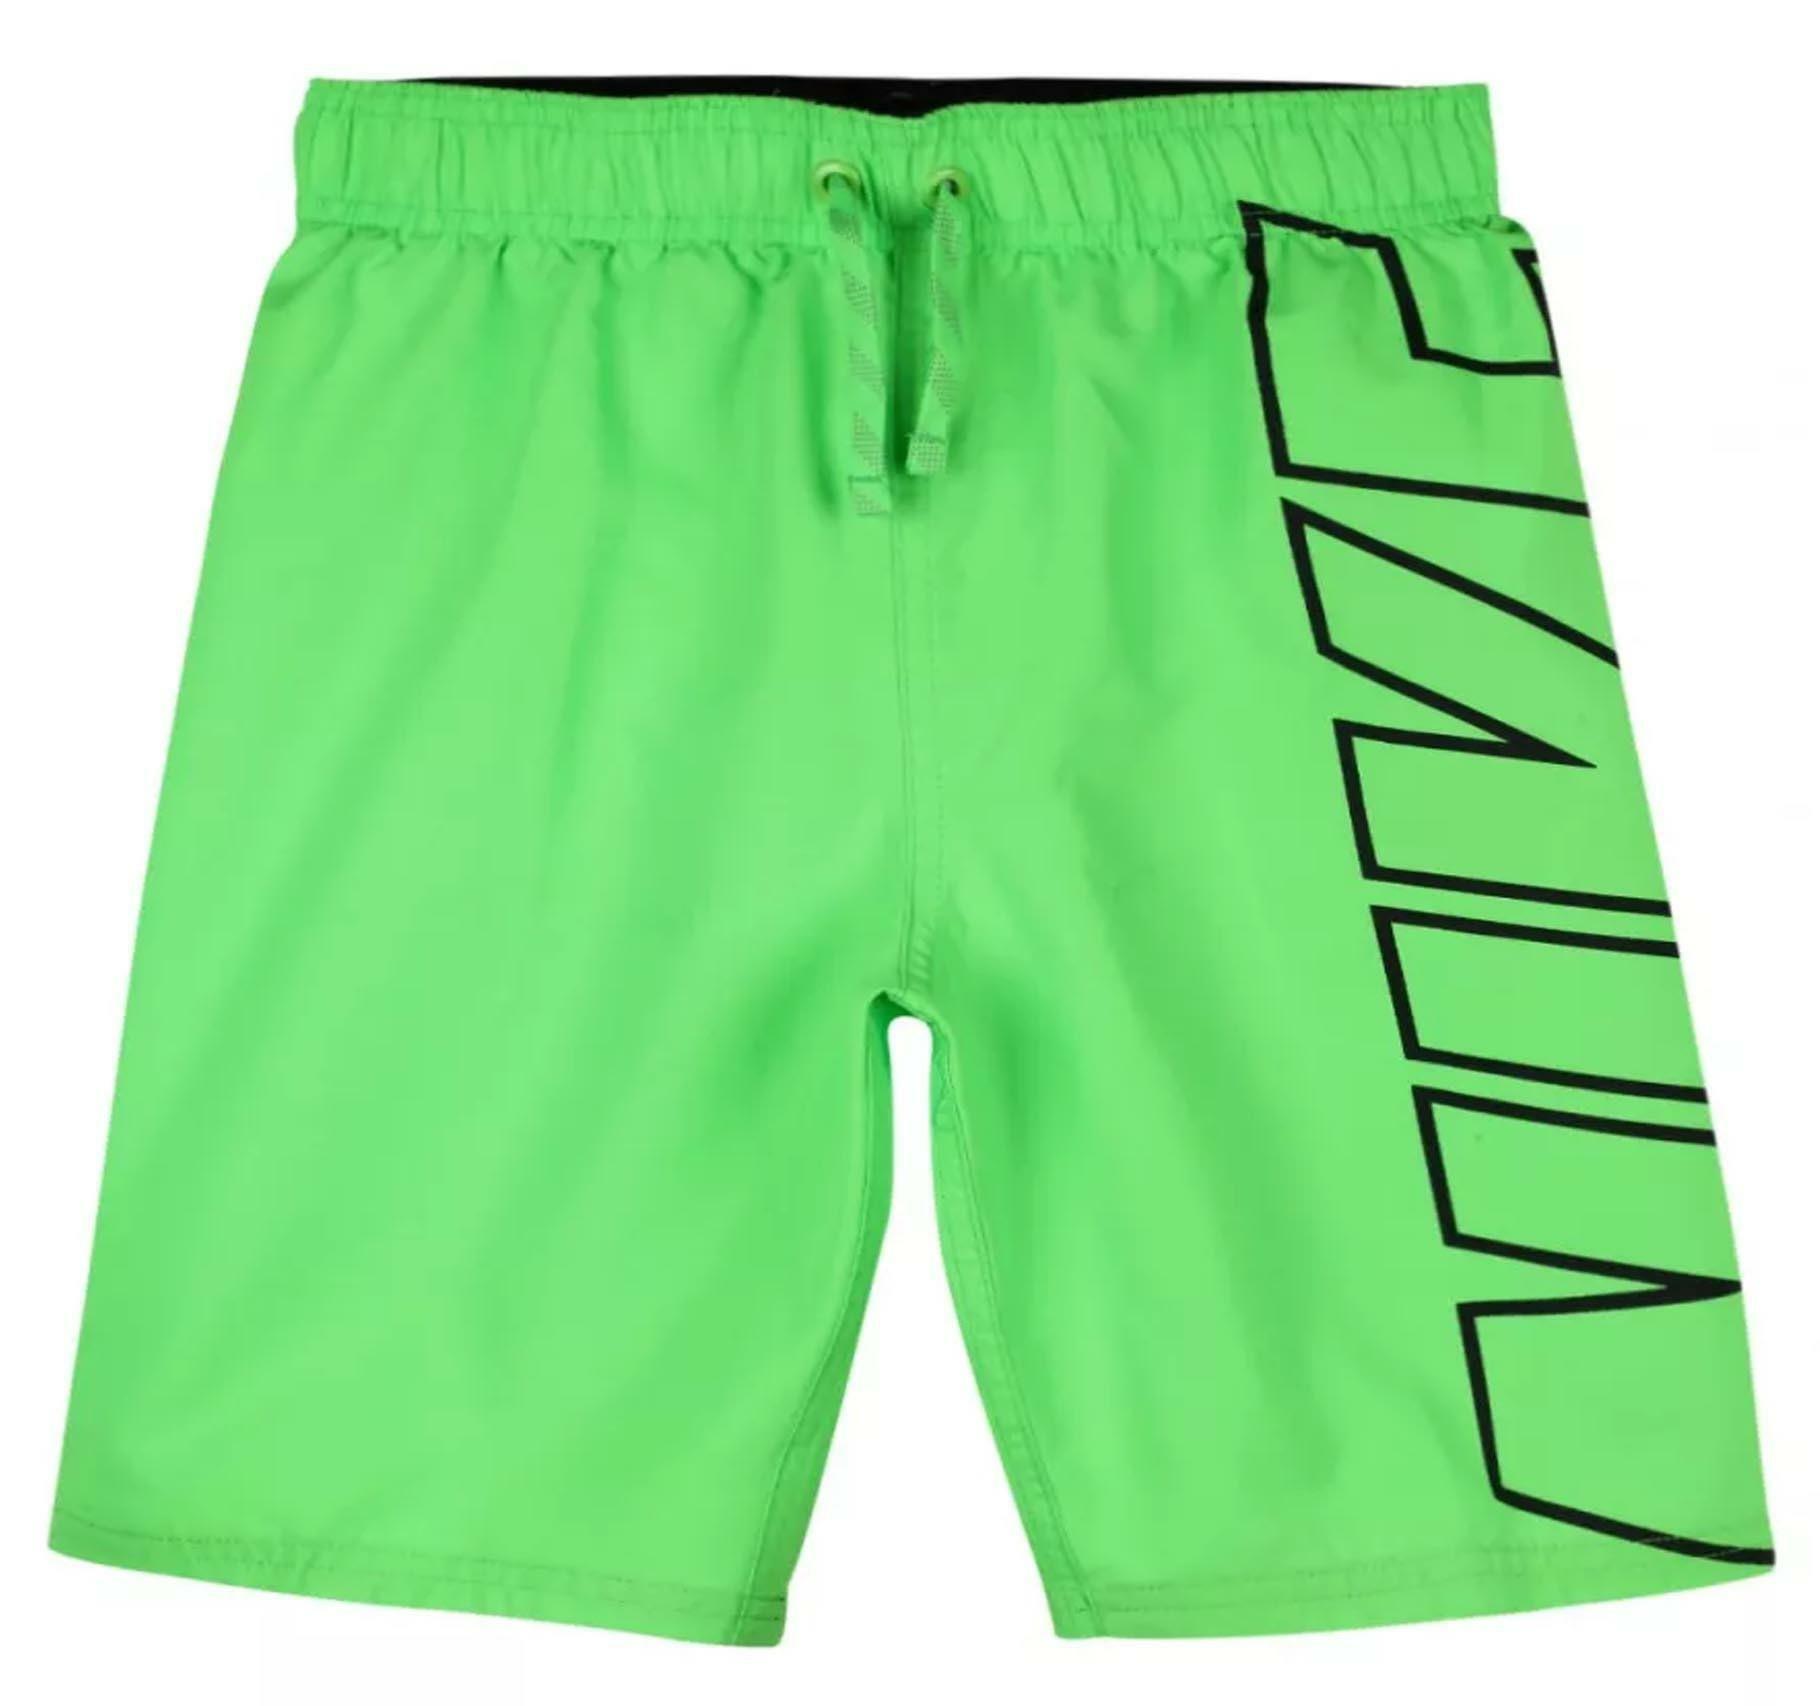 nike nike costume bambino verde fluo ness8650370